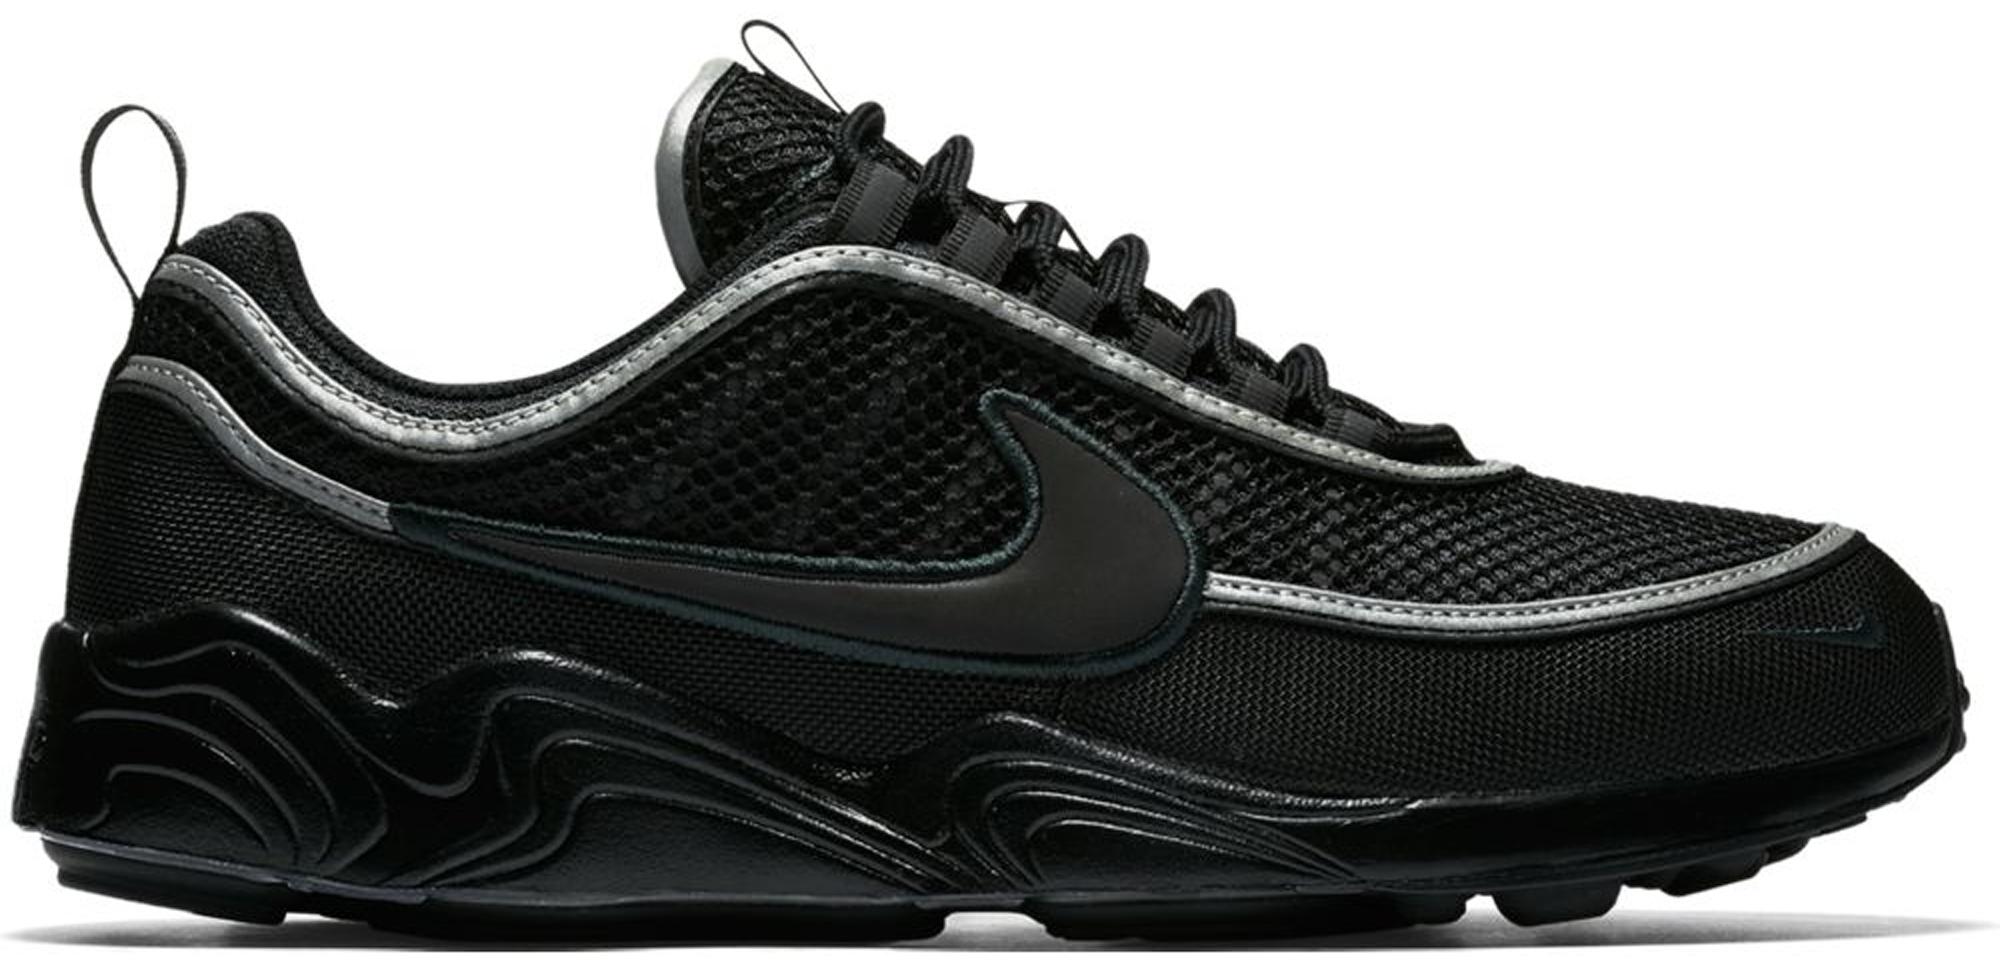 Nike Air Zoom Spiridon 16 Black